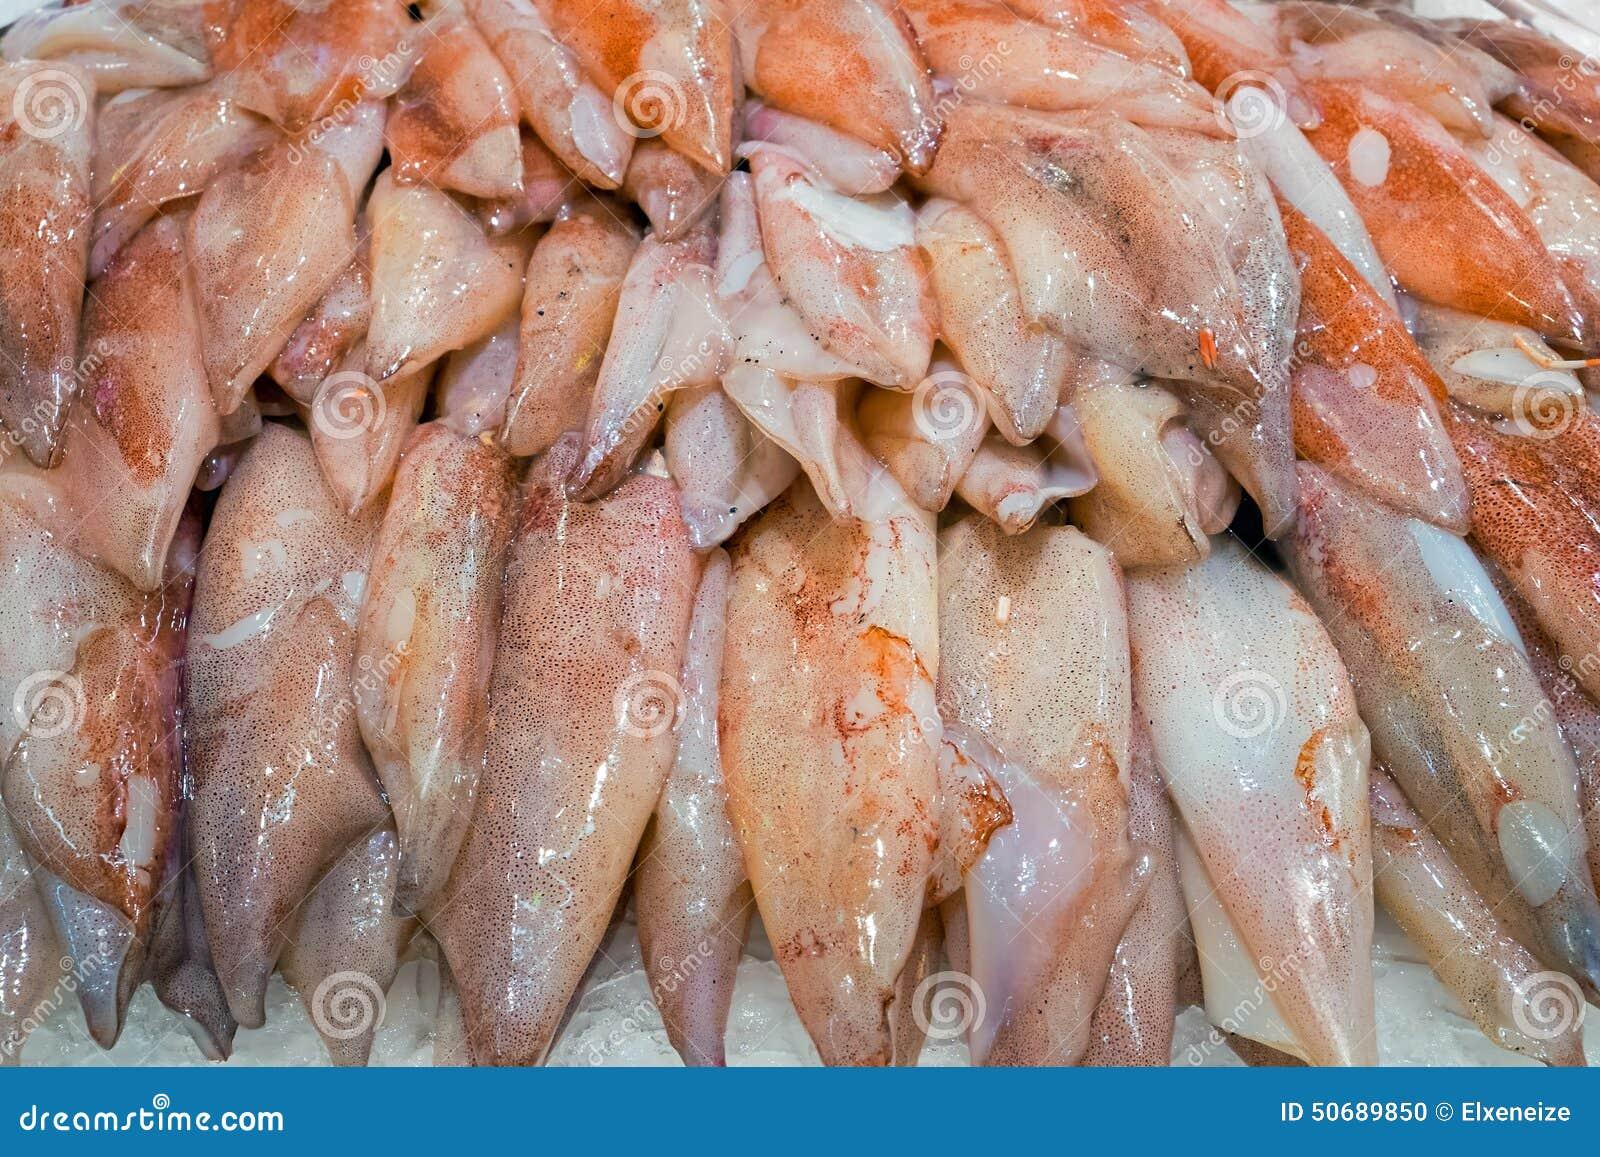 Download 新鲜的乌贼待售在市场上 库存照片. 图片 包括有 紫色, 水下, 触手, 海鲜, 海洋, 枪乌贼, 软体动物 - 50689850